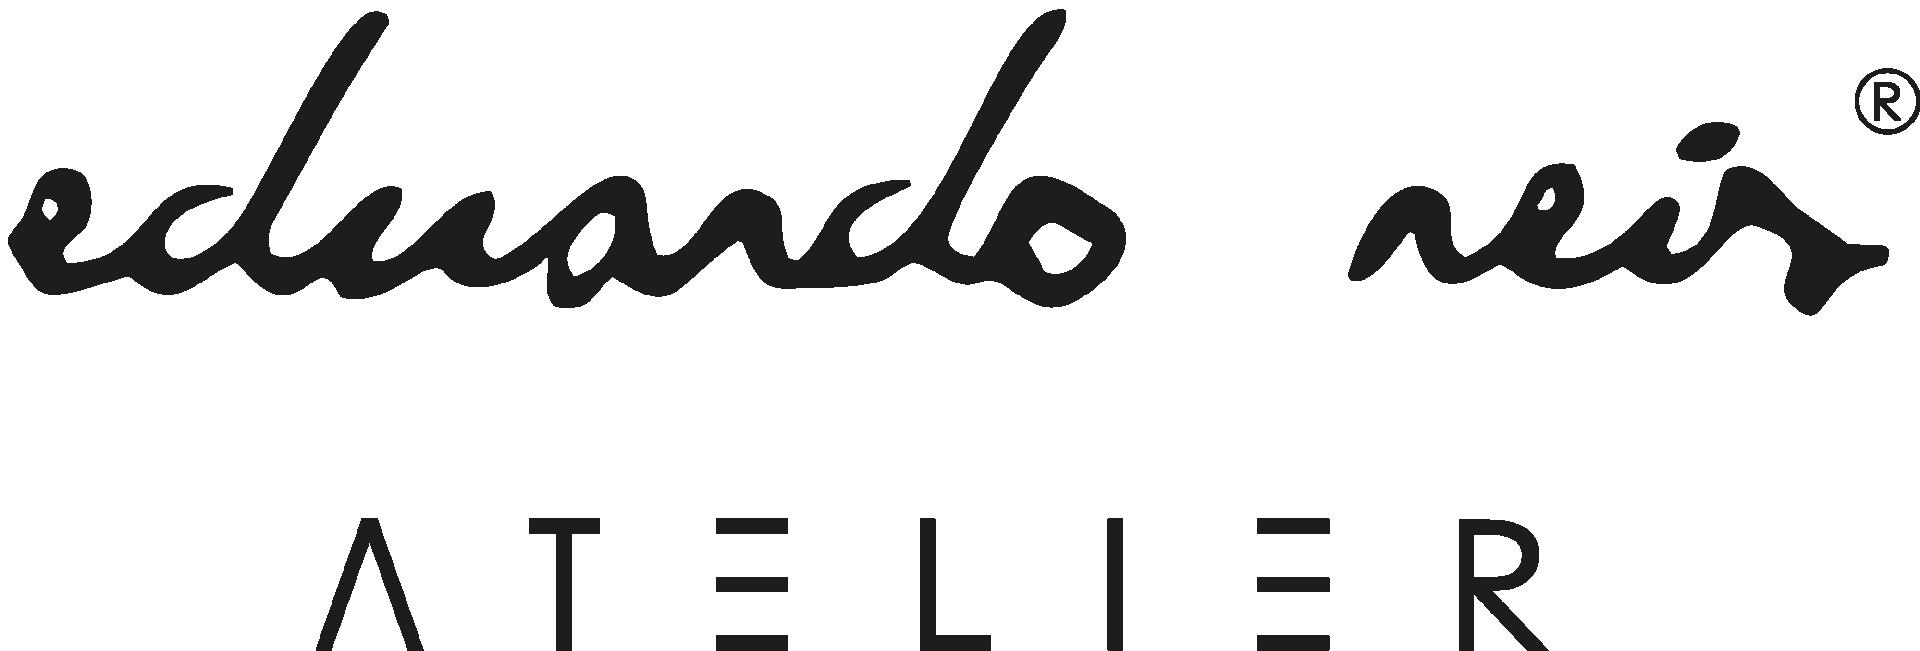 eduardo_reis-1.png